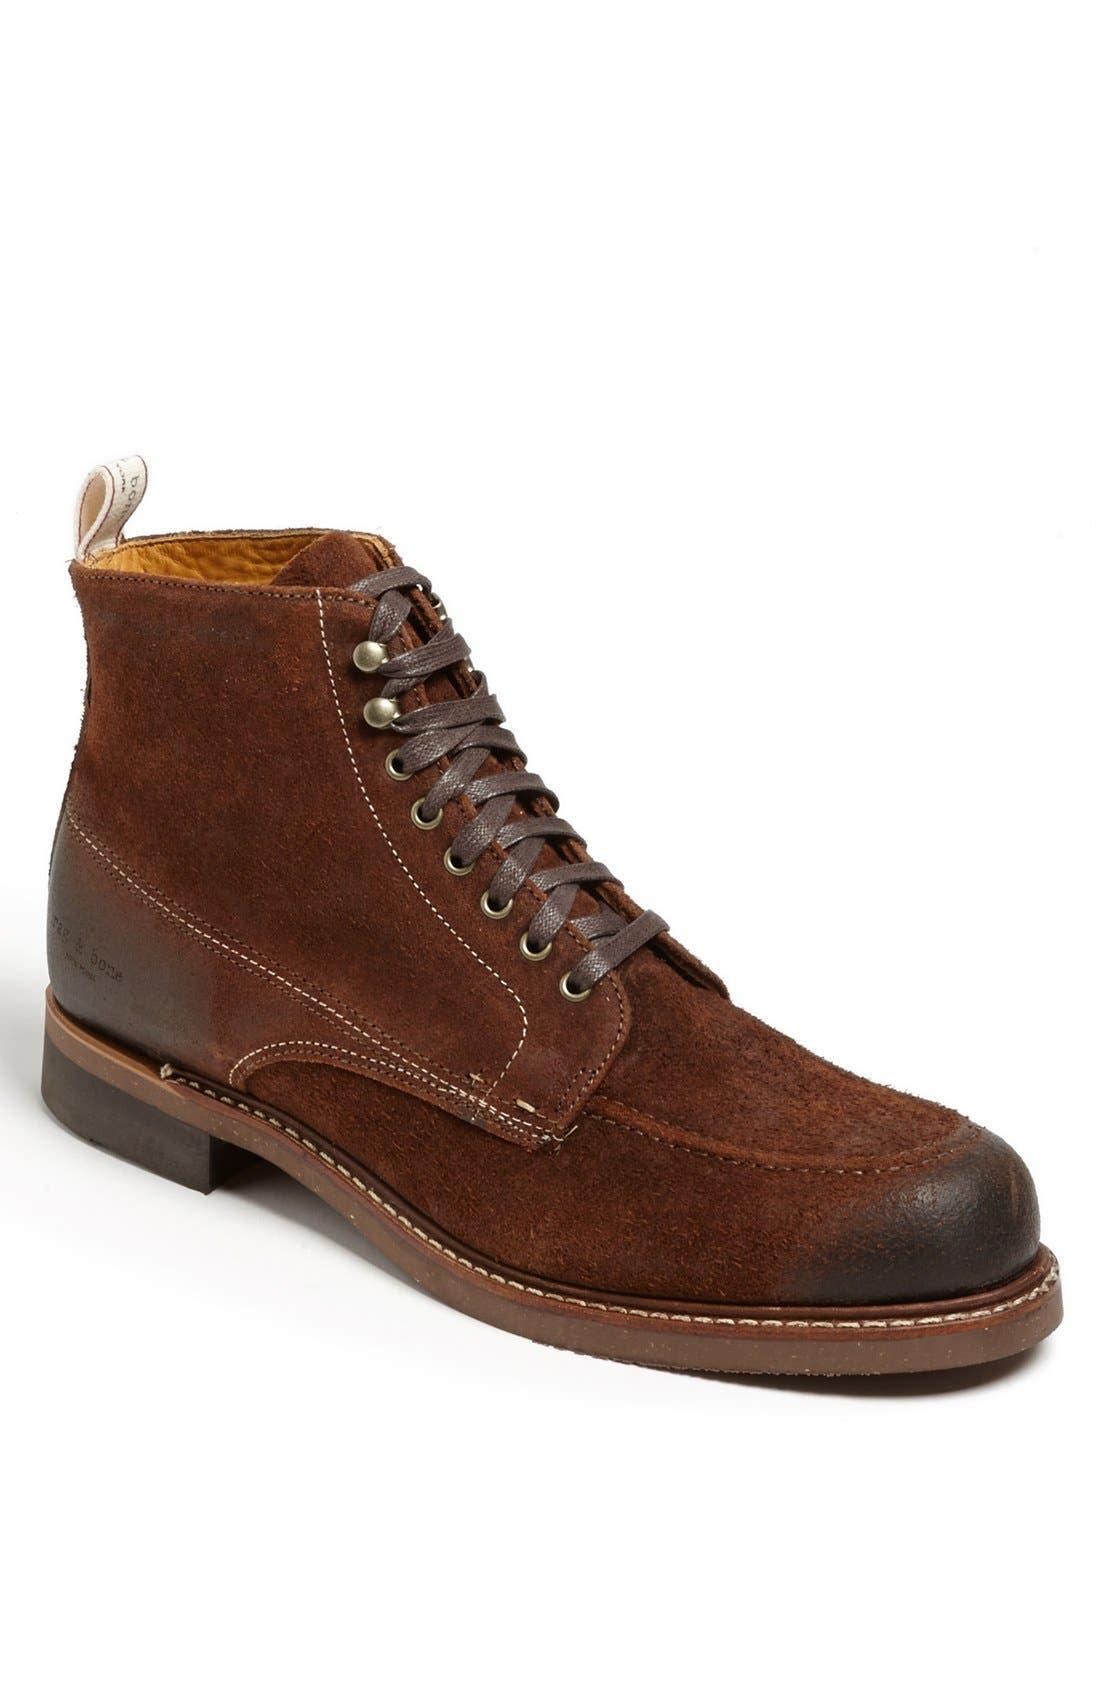 'Rowan' Moc Toe Boot,                             Main thumbnail 1, color,                             200